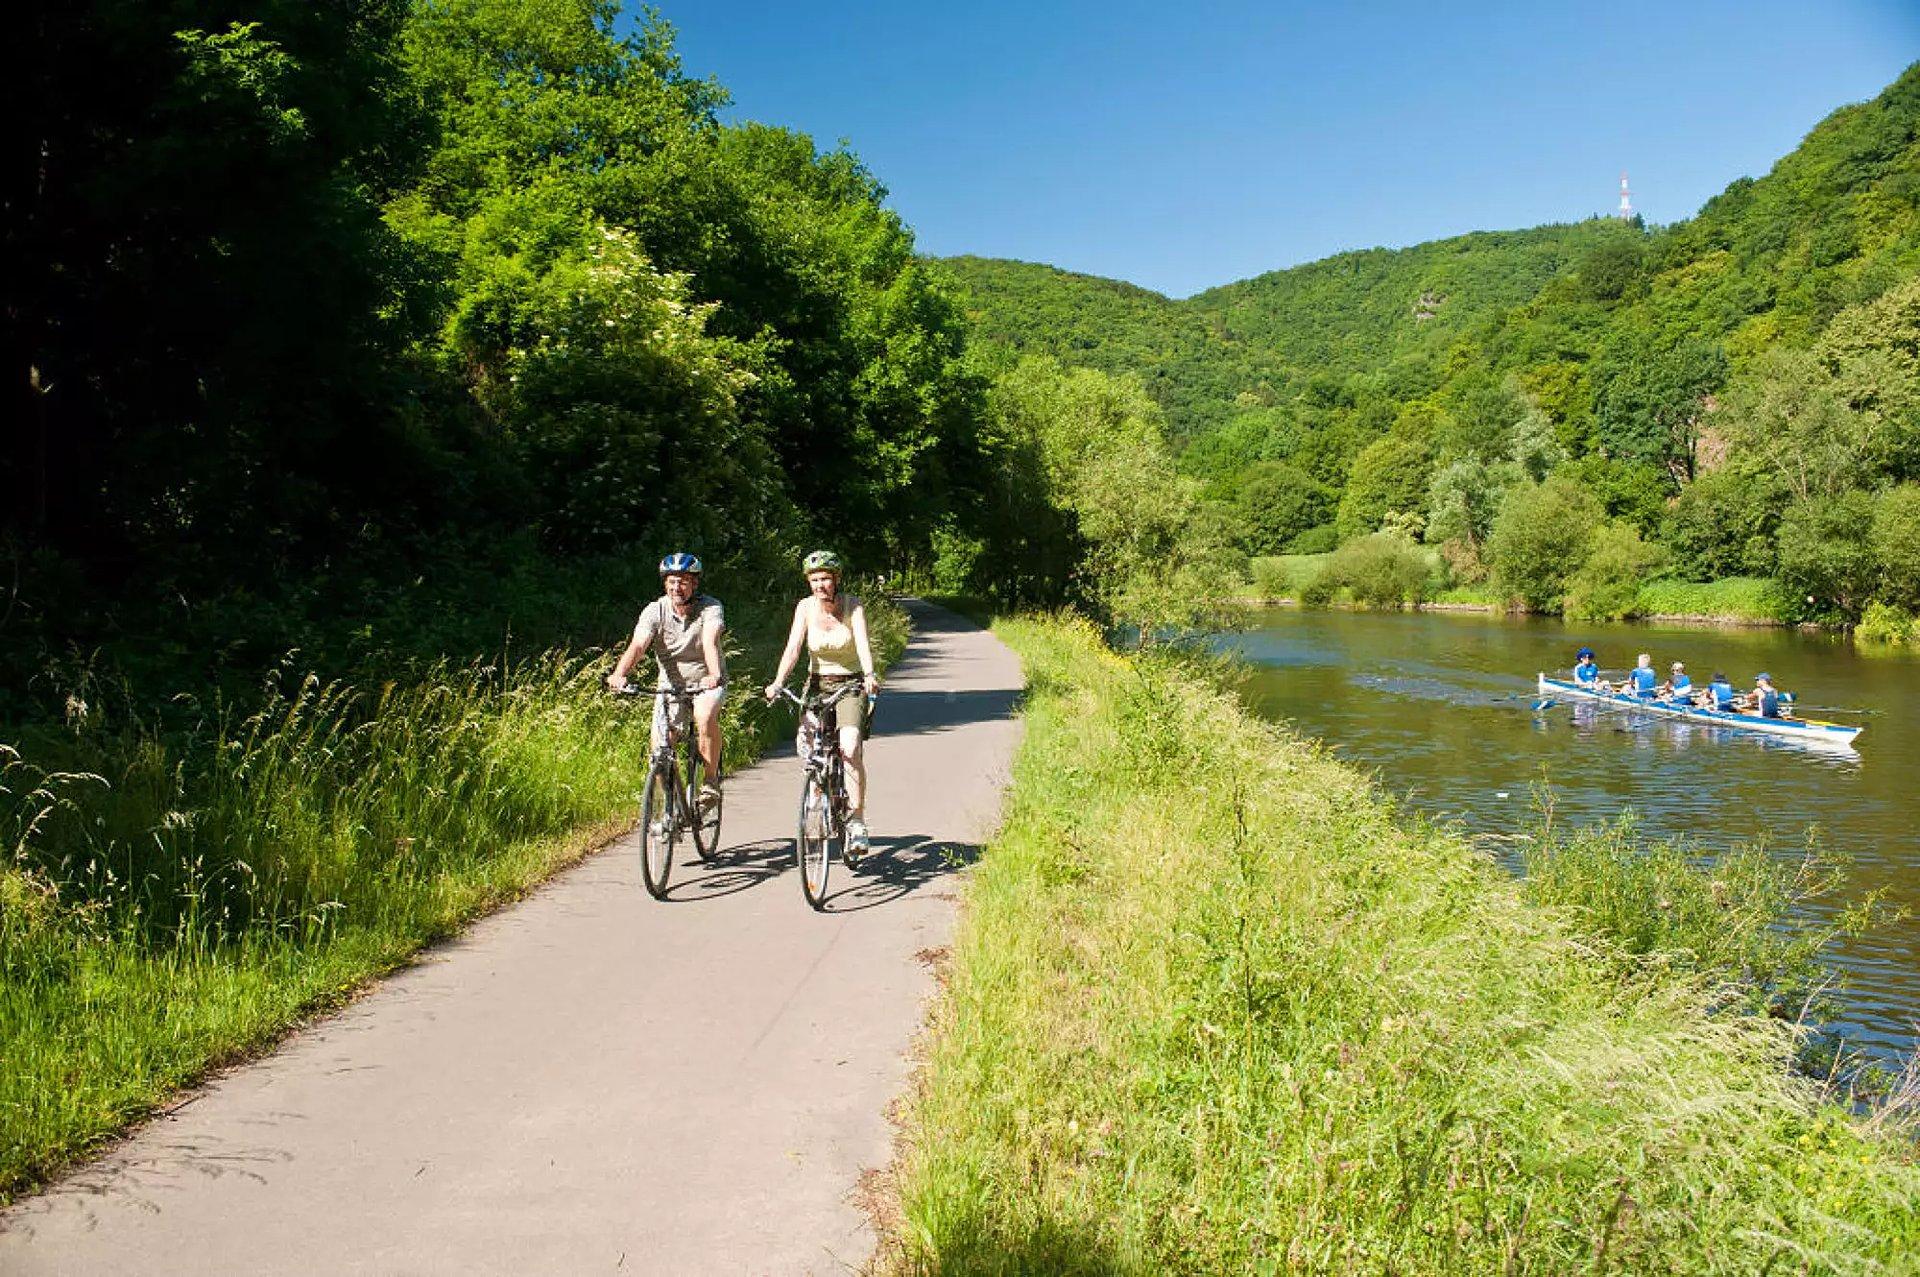 Radfahrer auf den Lahnradweg bei Obernhof, Lahntal